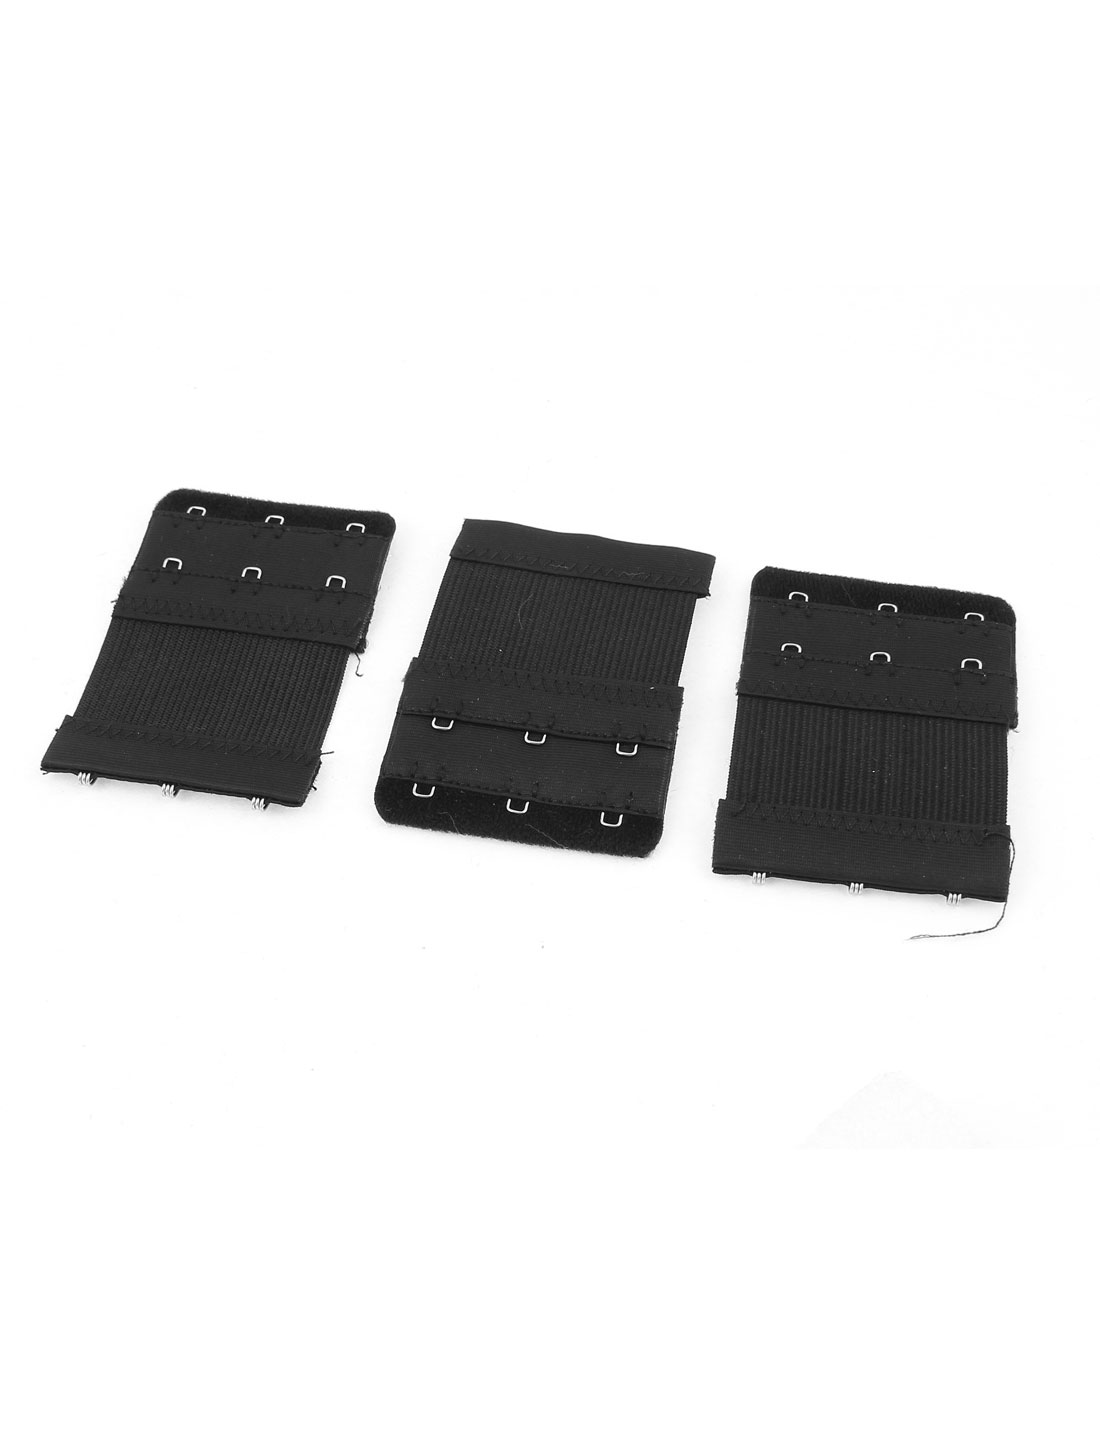 3pcs Eye Closure Dual Row 3 Hooks Spandex Stretch Soft Underwear Bra Strap Back Band Extension Extenders Black for Woman